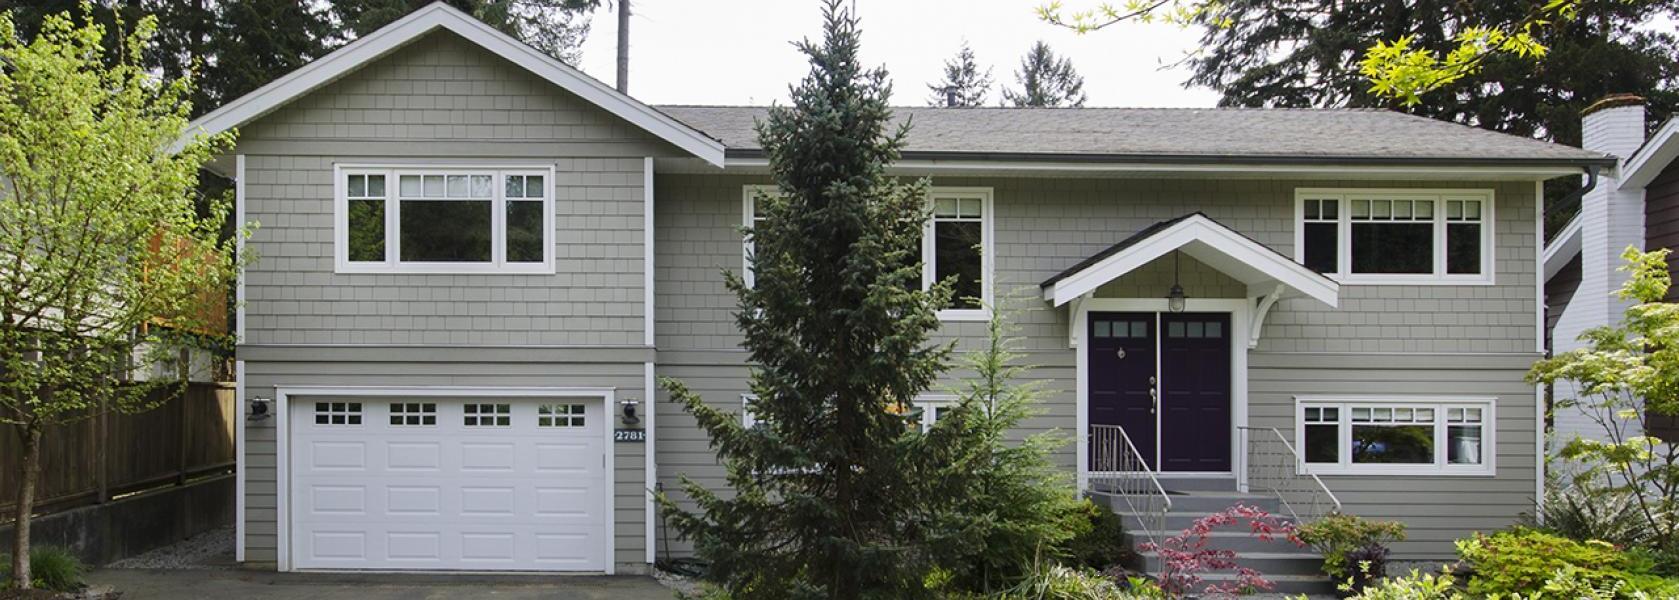 2781 Sechelt Drive, Blueridge NV, North Vancouver